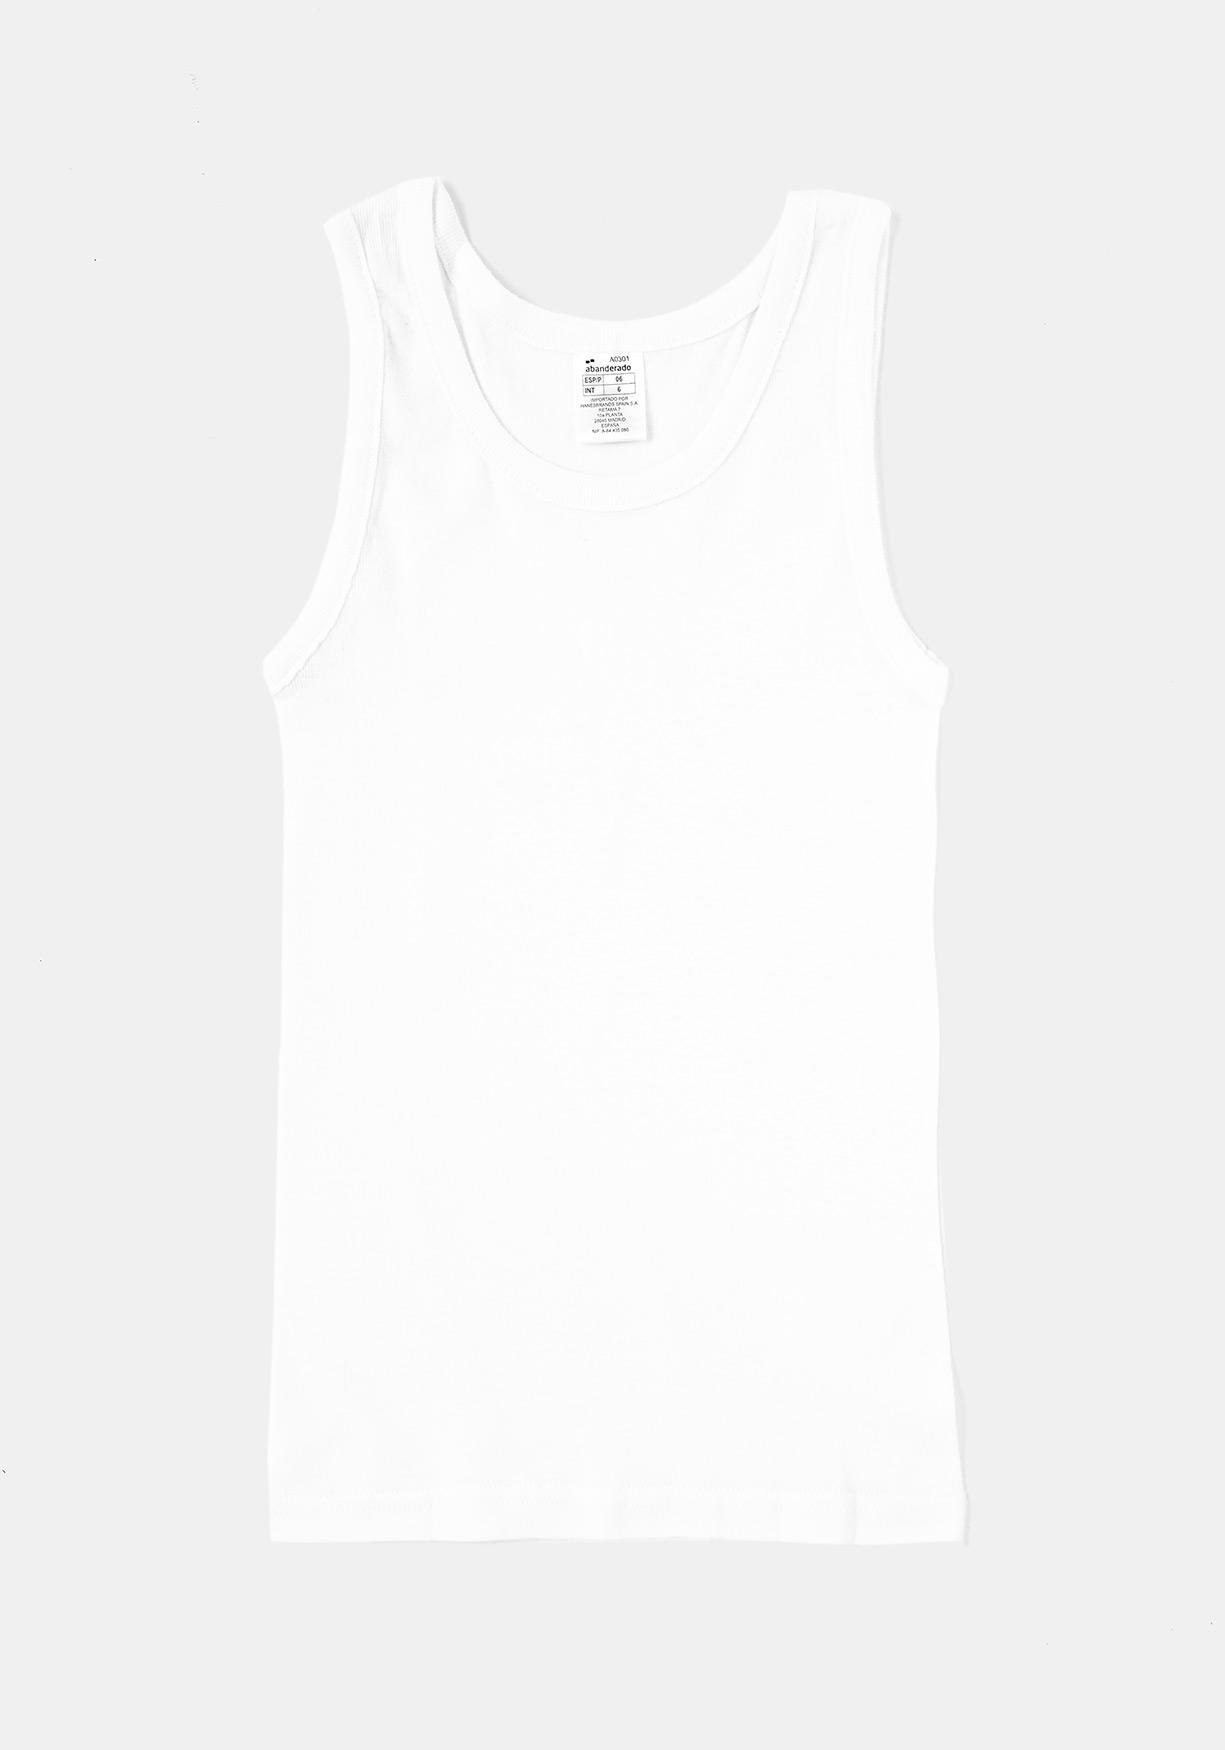 Interior Camiseta Sin Unisex Mangas Abanderado¡aprovéchate Comprar xhdBQrtsC